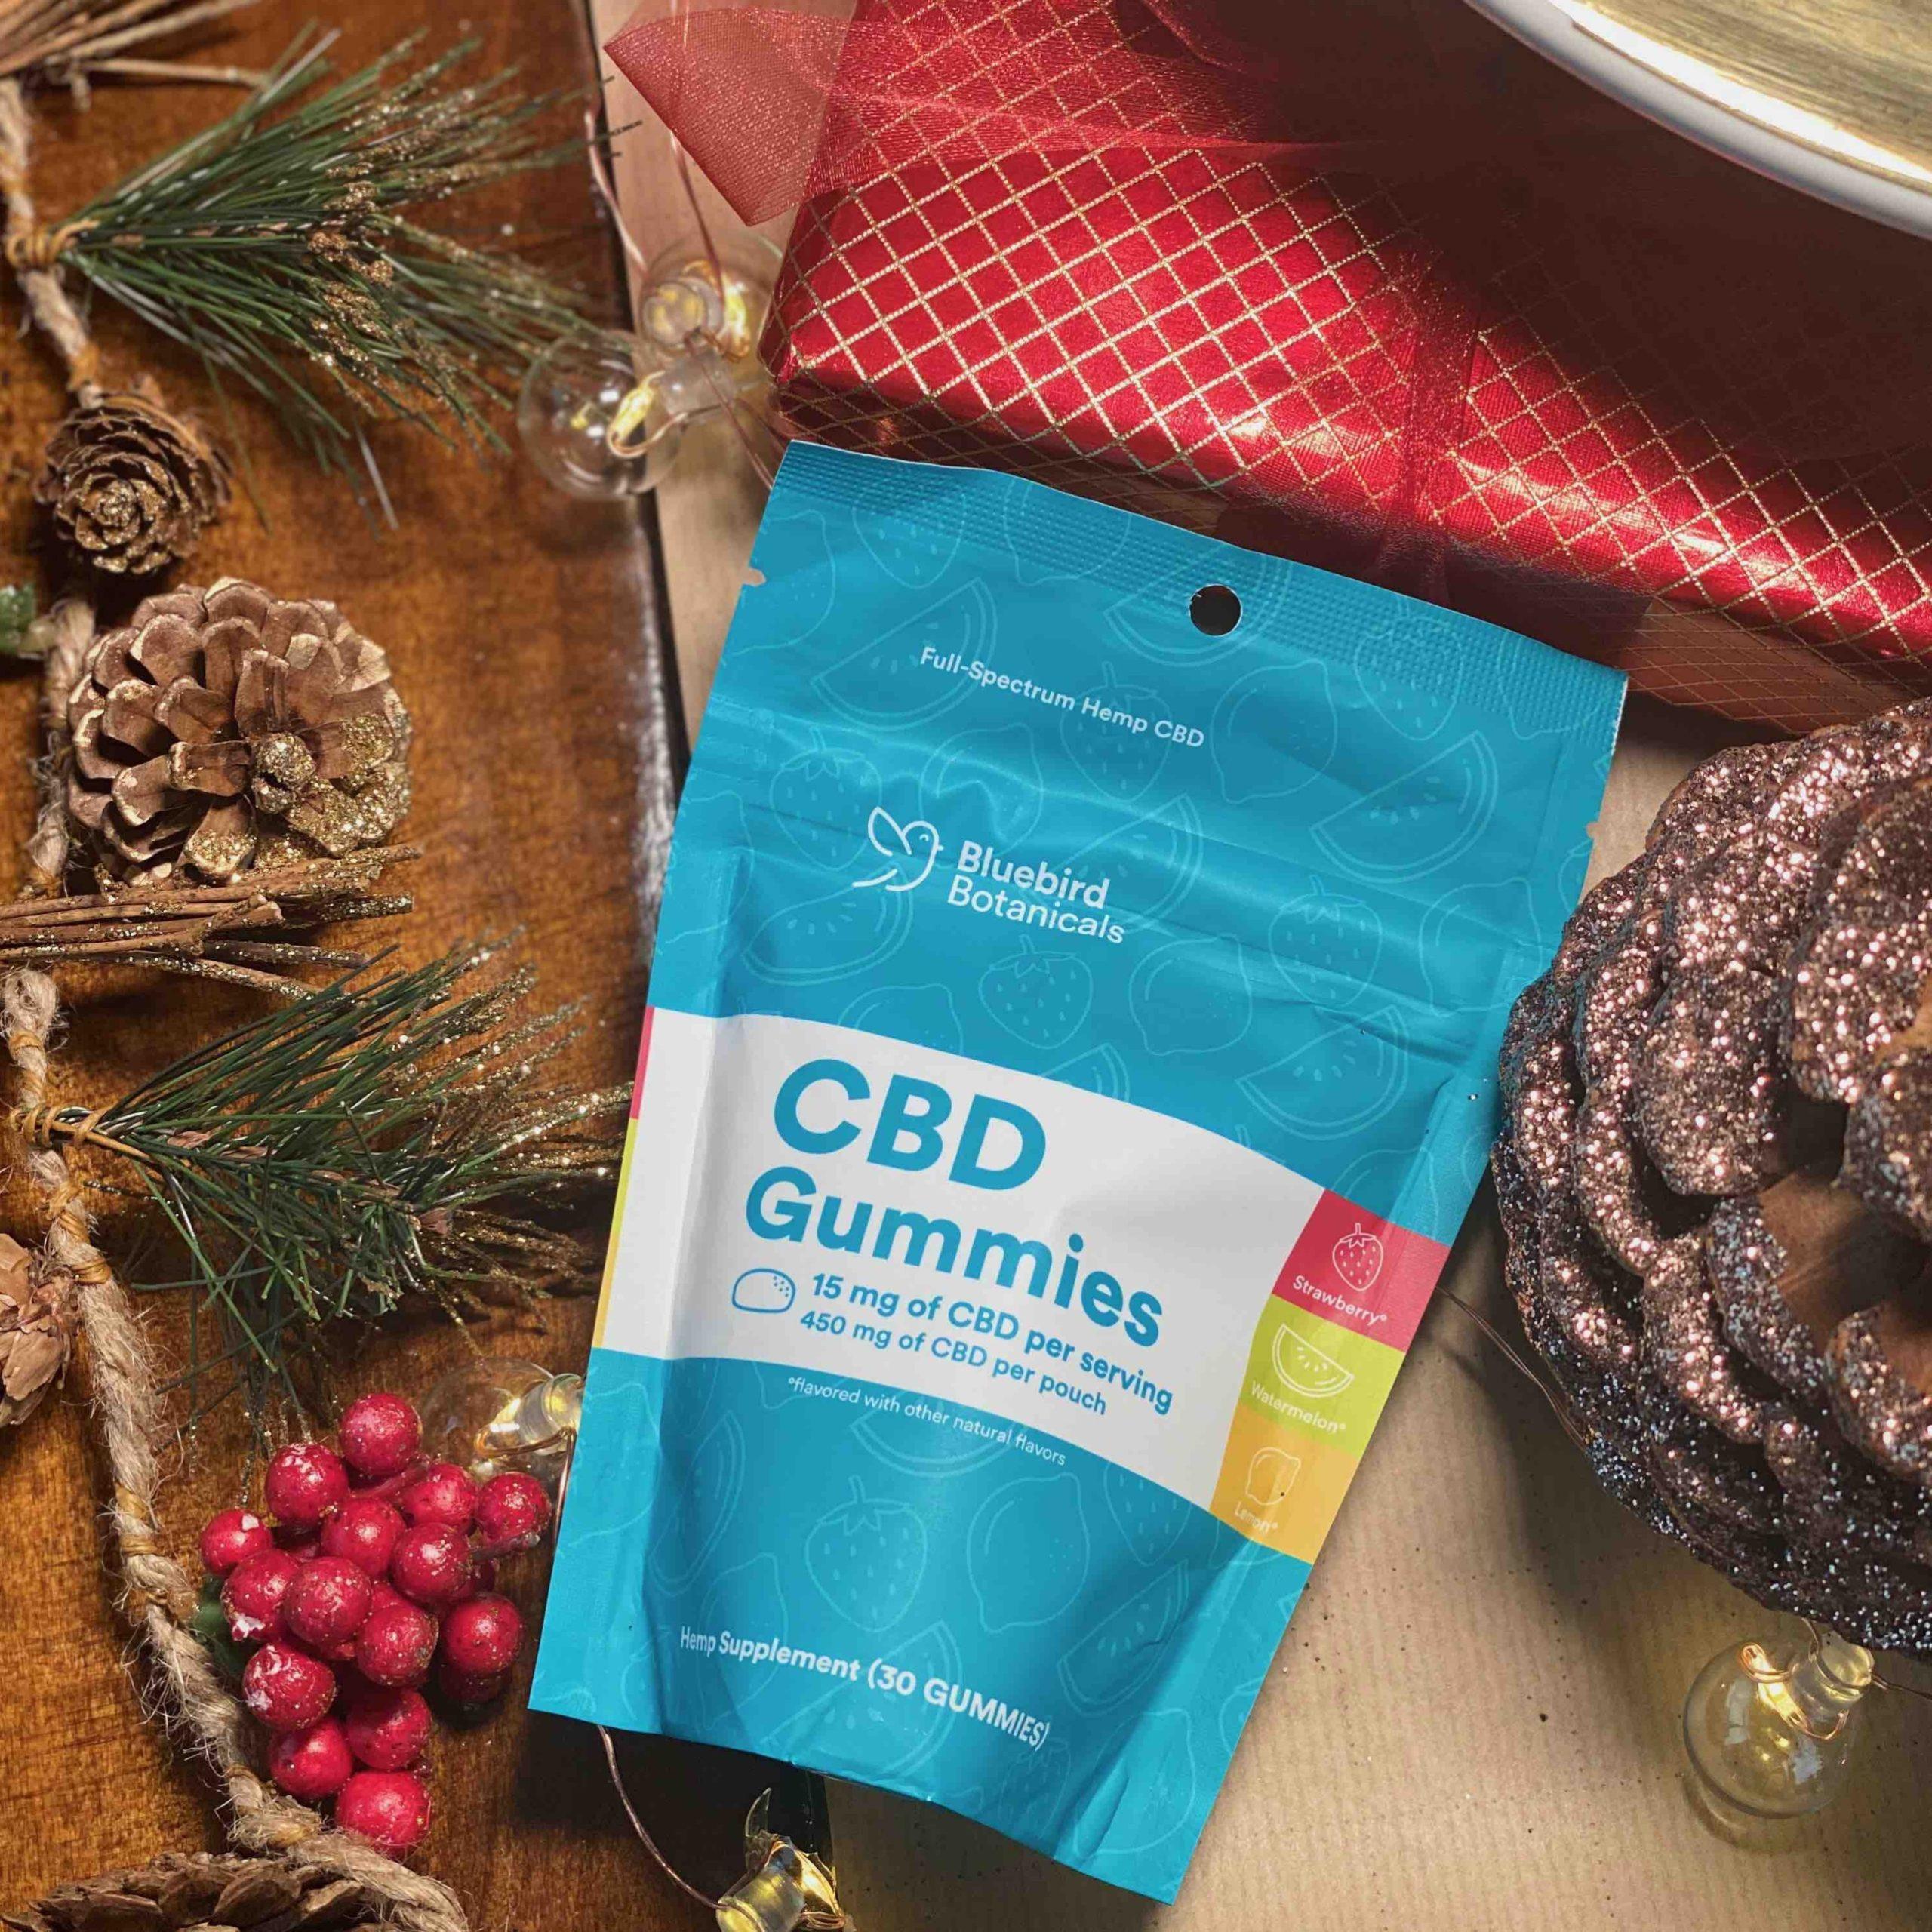 Bluebird Botanicals CBD Gummies Gift